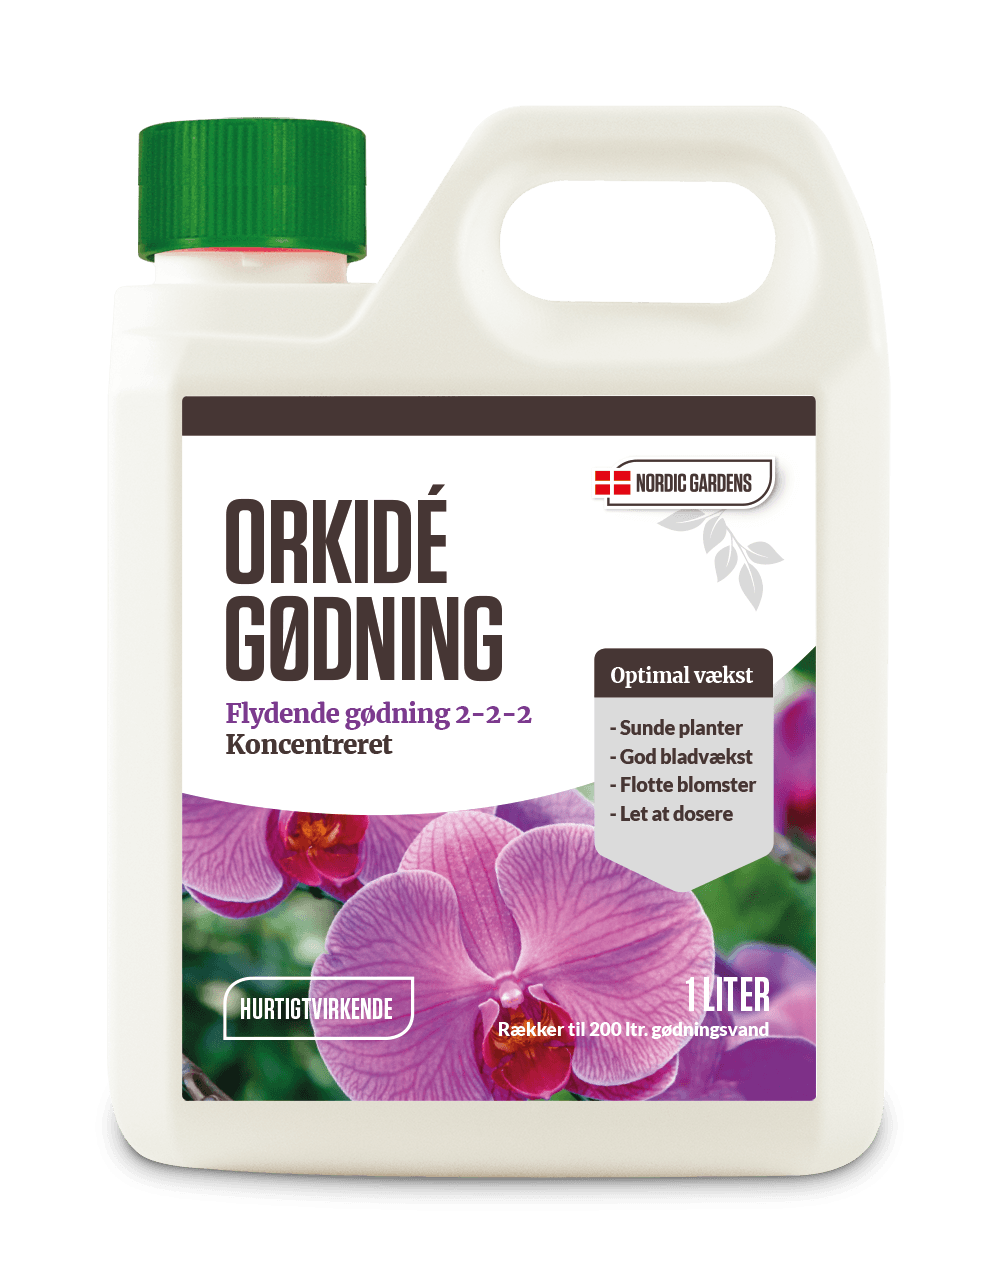 Nordic Gardens Orkidégødning 1 liter